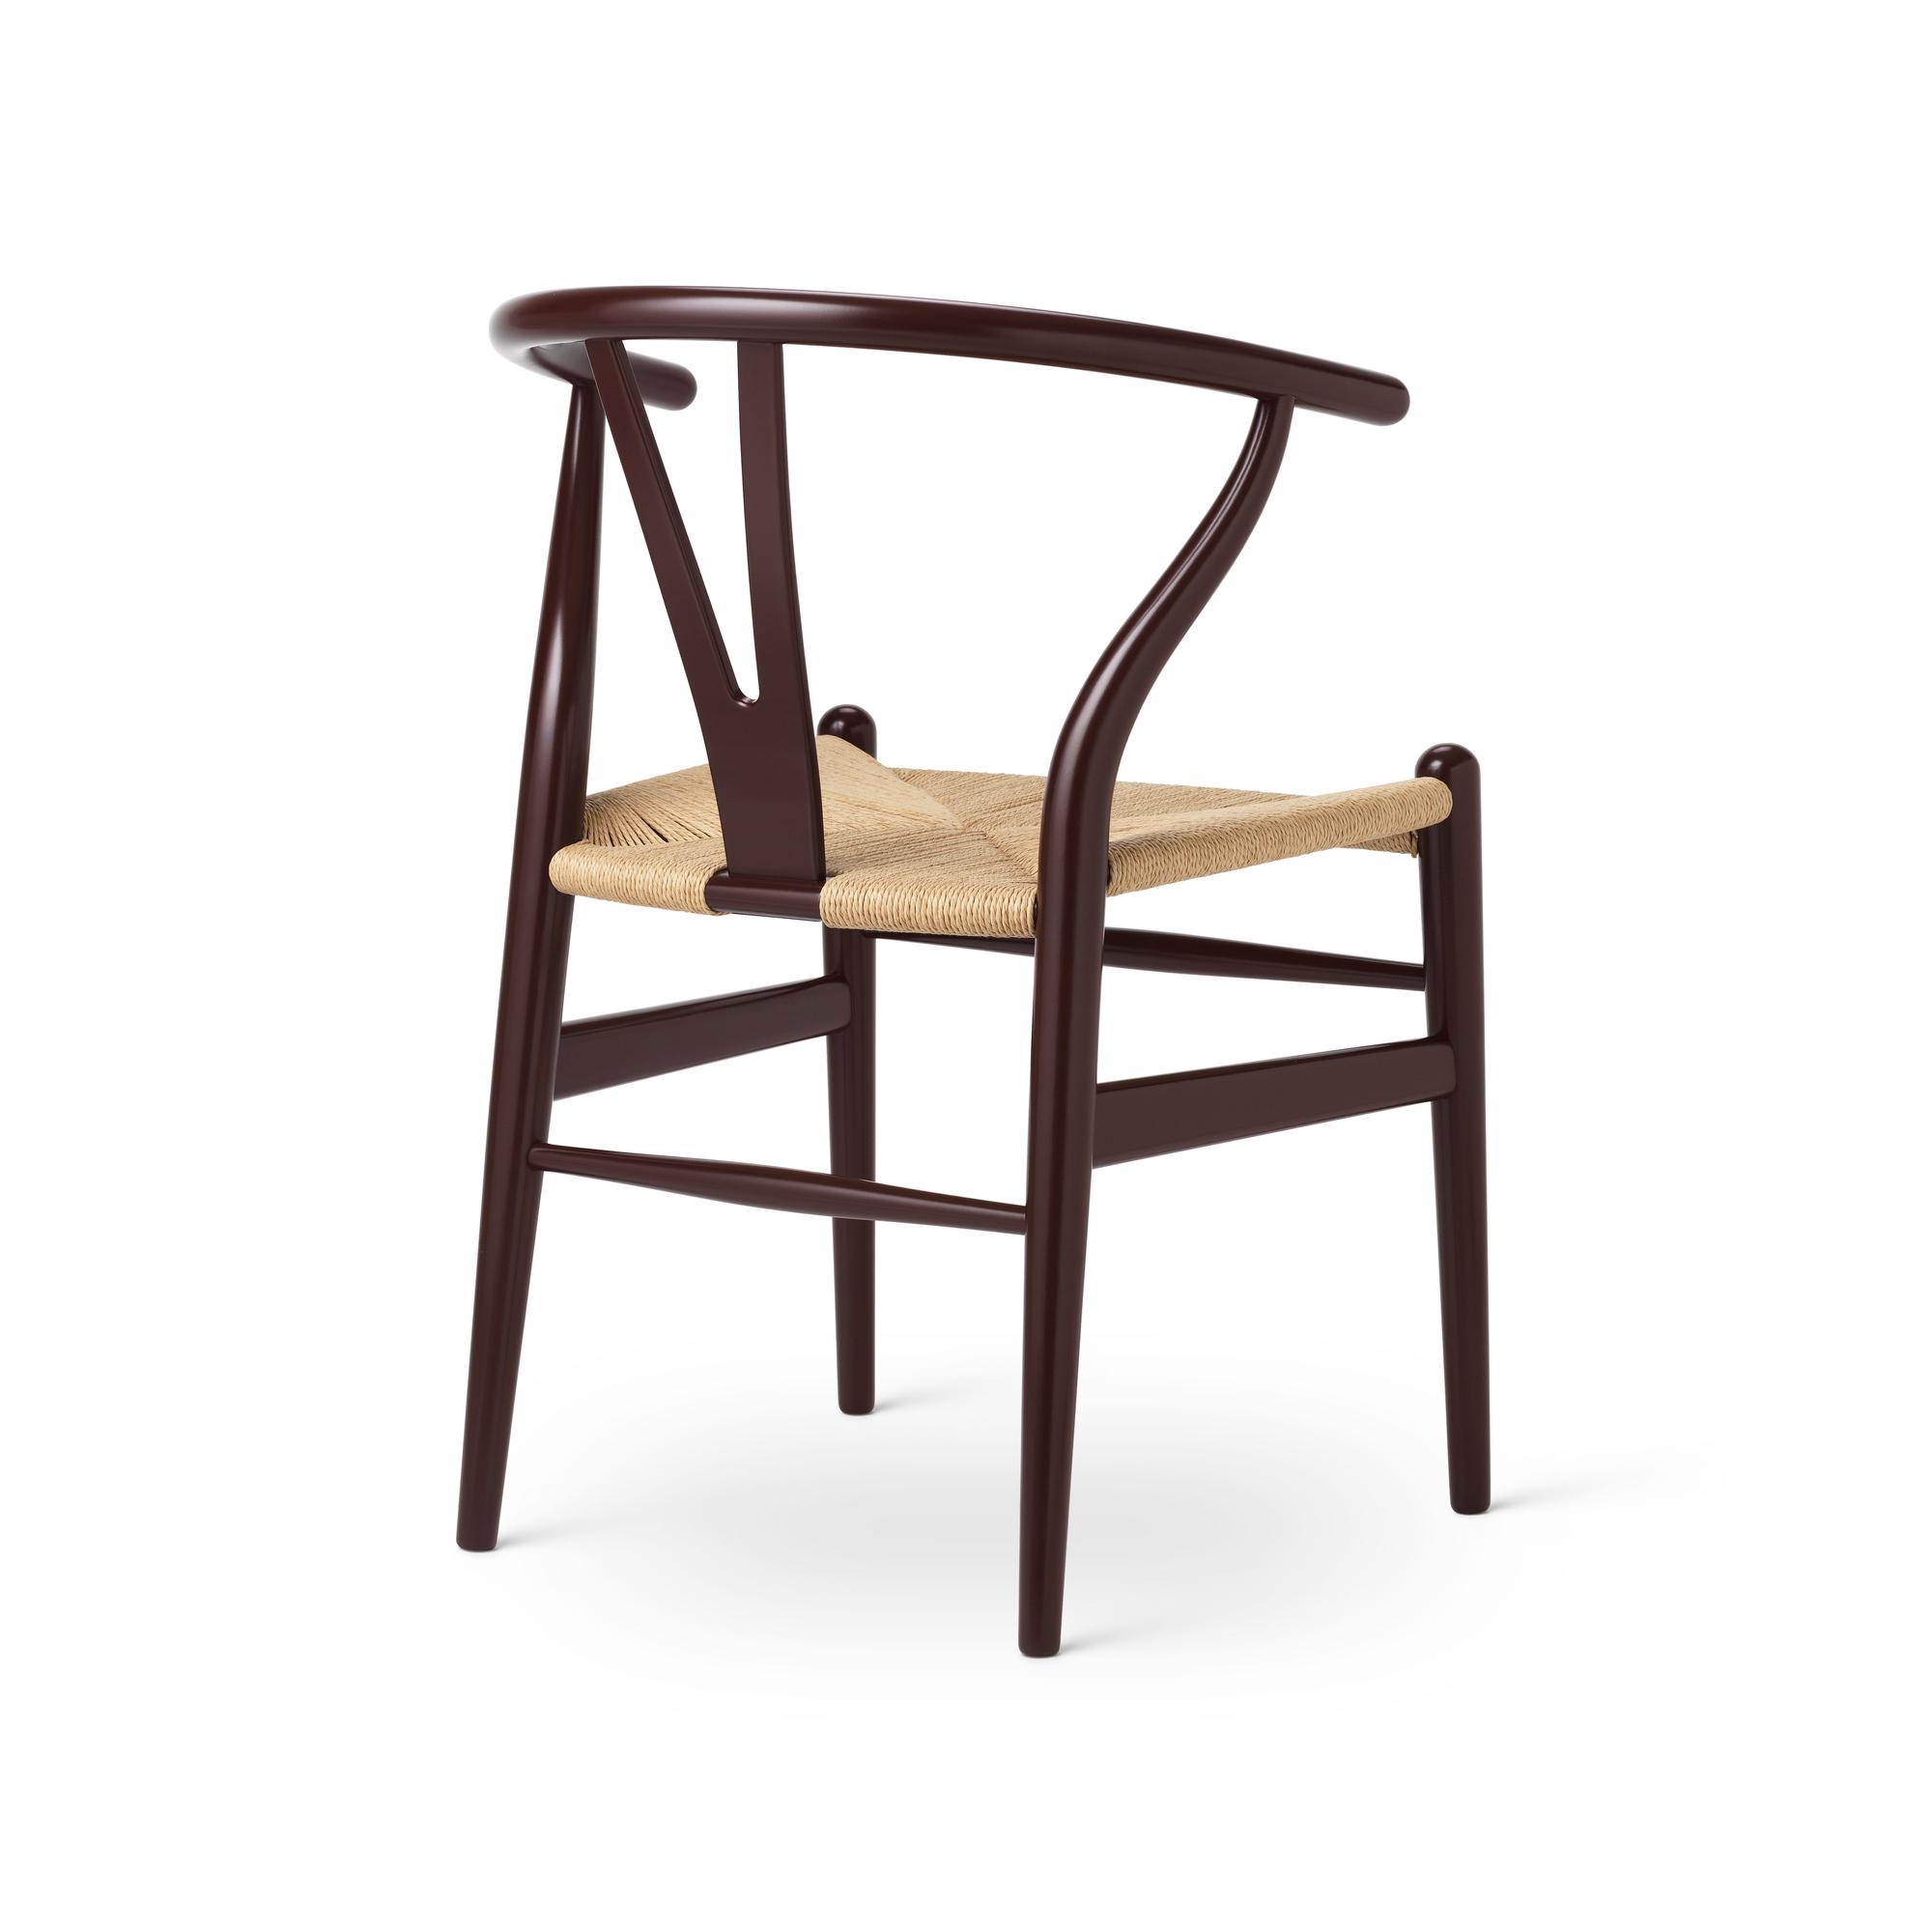 CH24 Wishbone Chair Russet & Blues or Harmony Carl Hansen& Søn